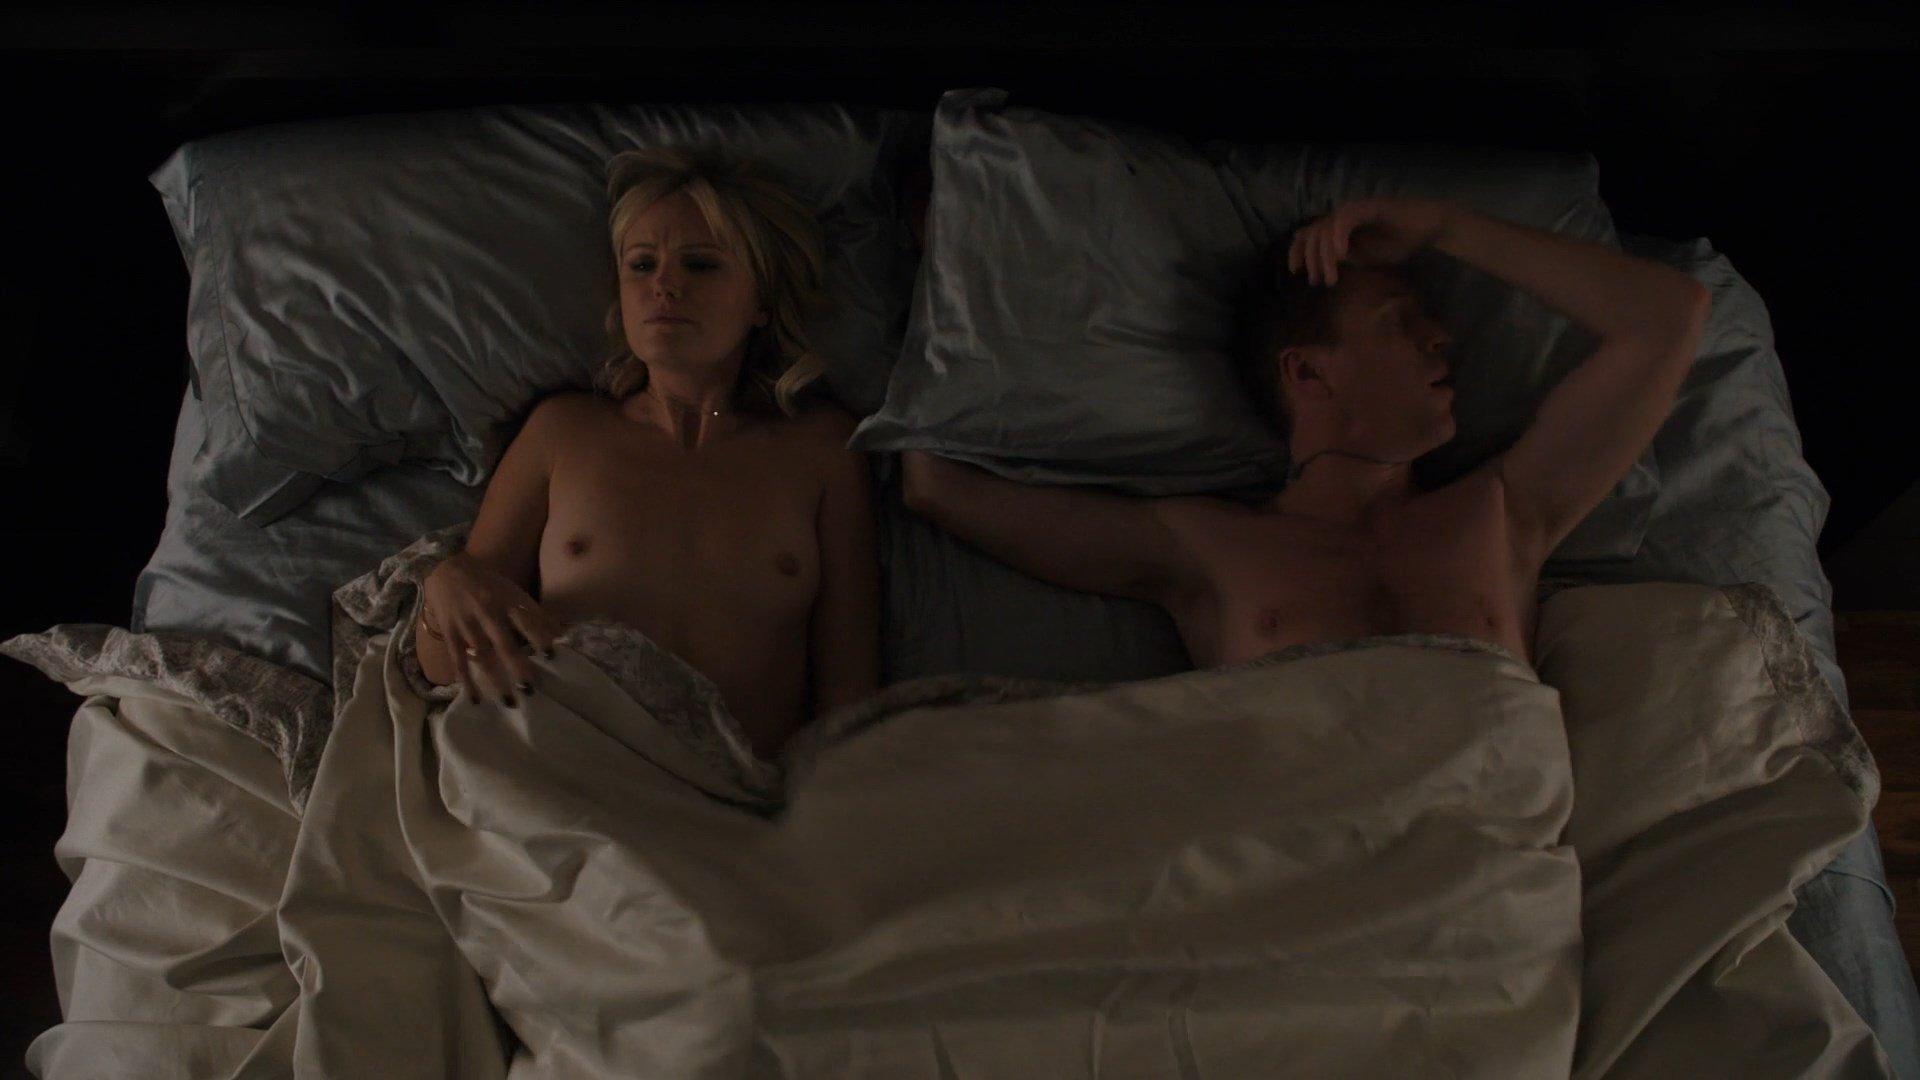 Celeb malin akermans hottest nude moments